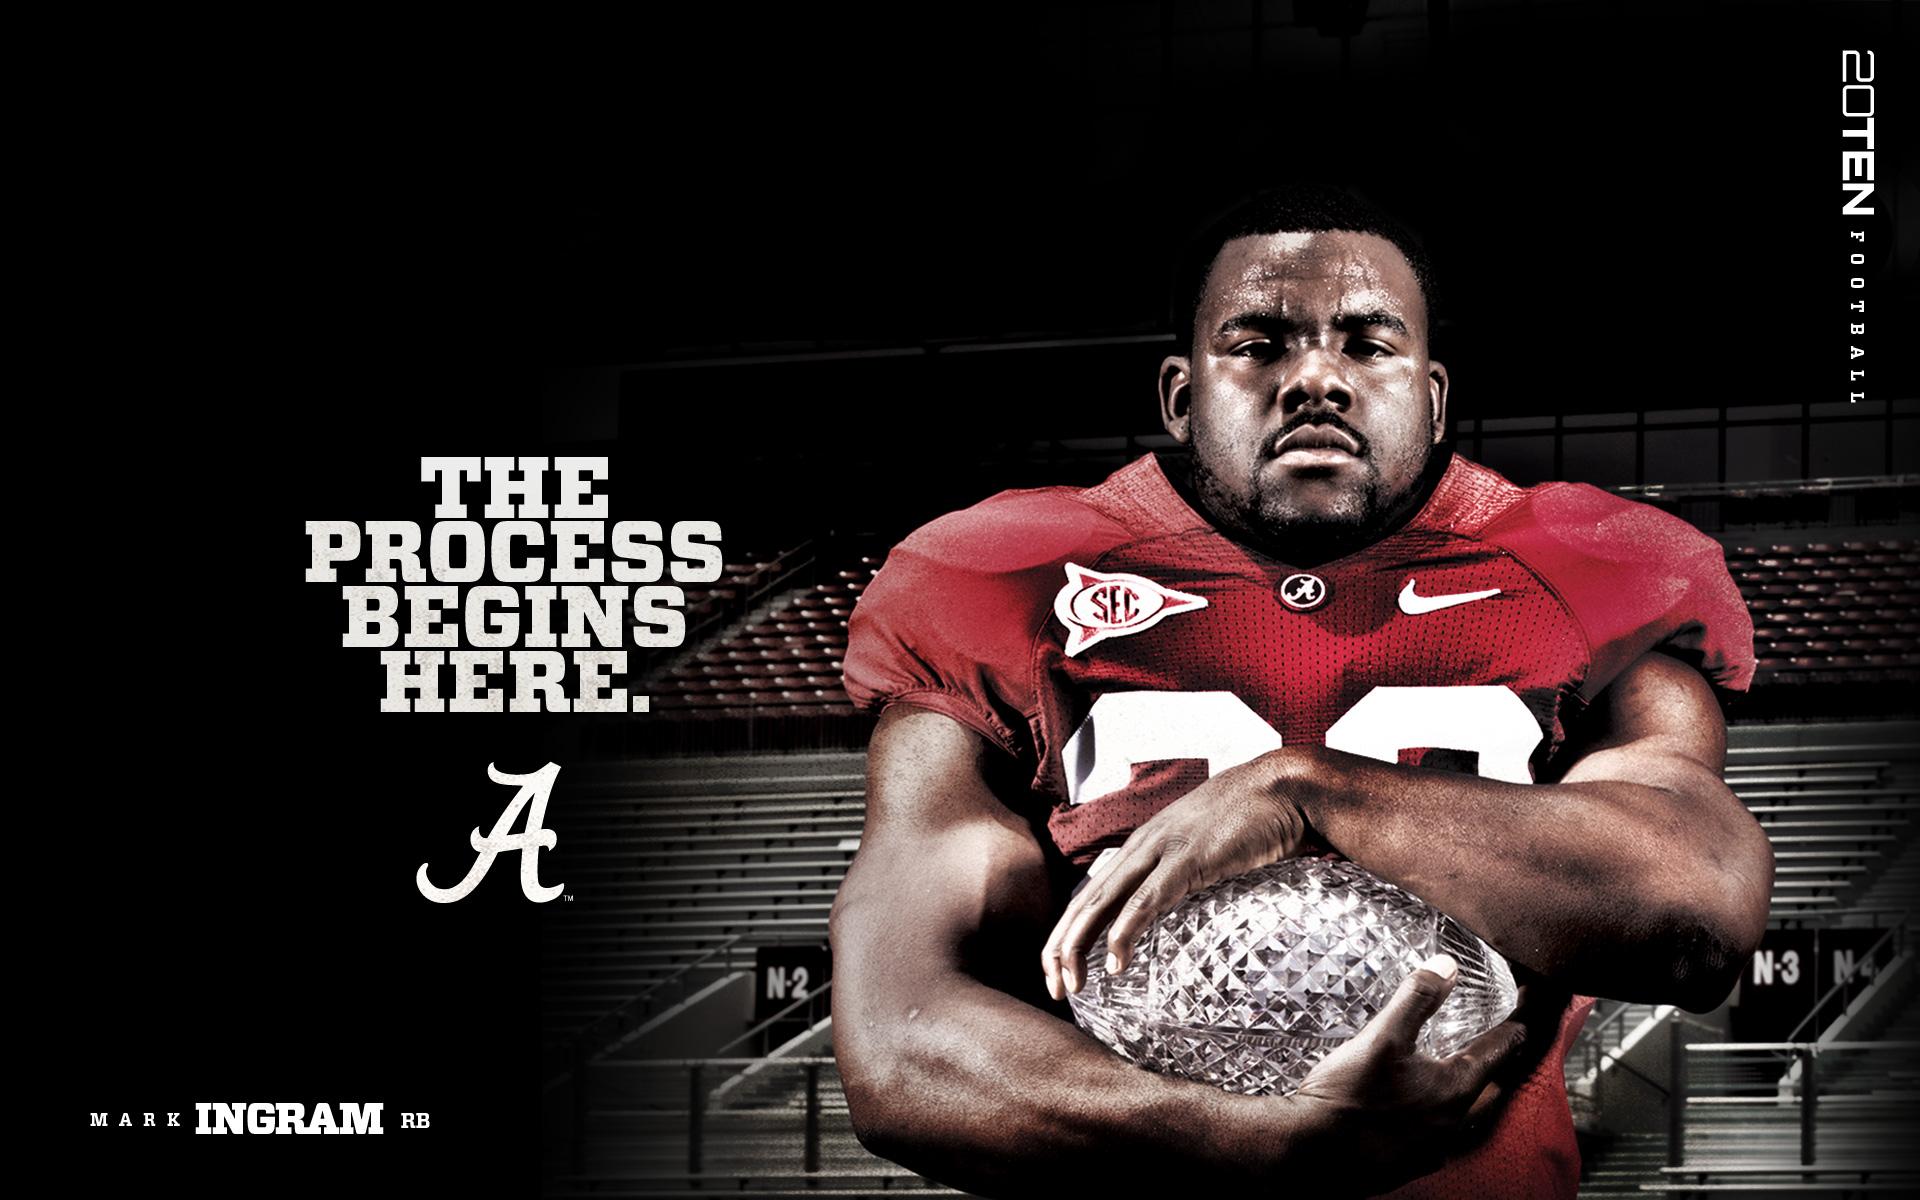 Image   Alabama Football Wallpapers  Alabama Football Wallpaper HD 1920x1200